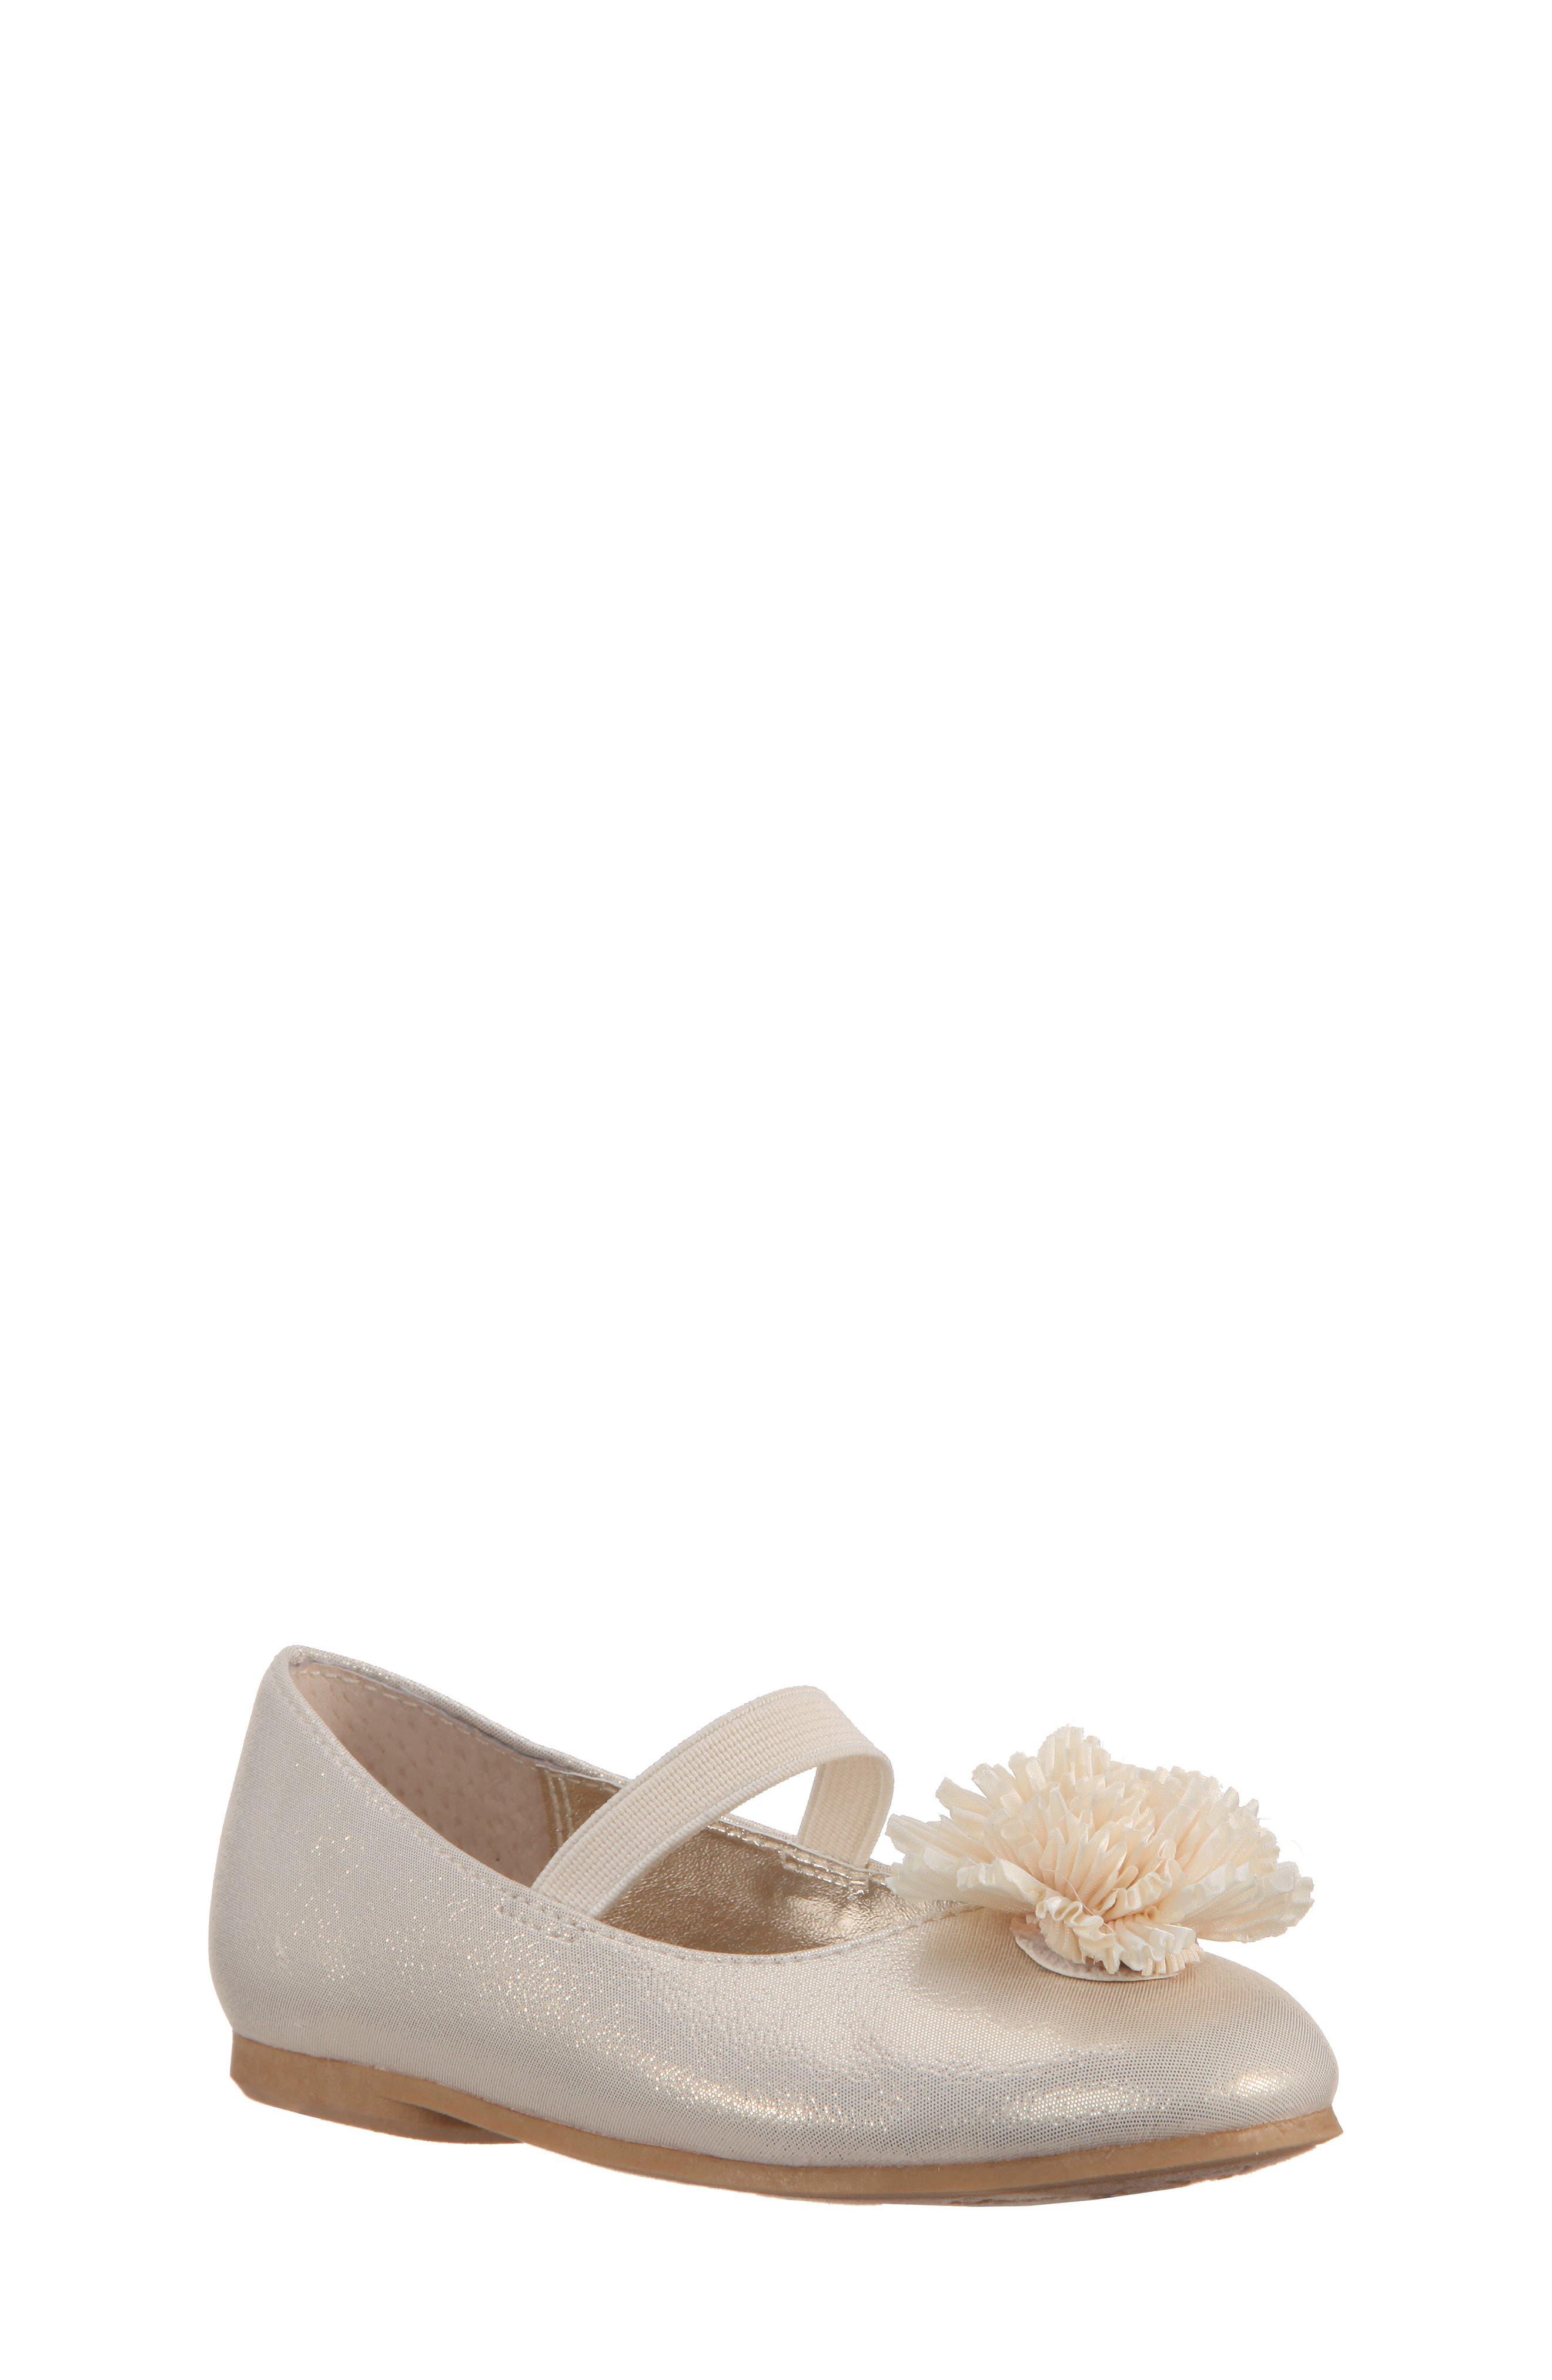 Jemma-T Bow Ballet Flat,                         Main,                         color, 040